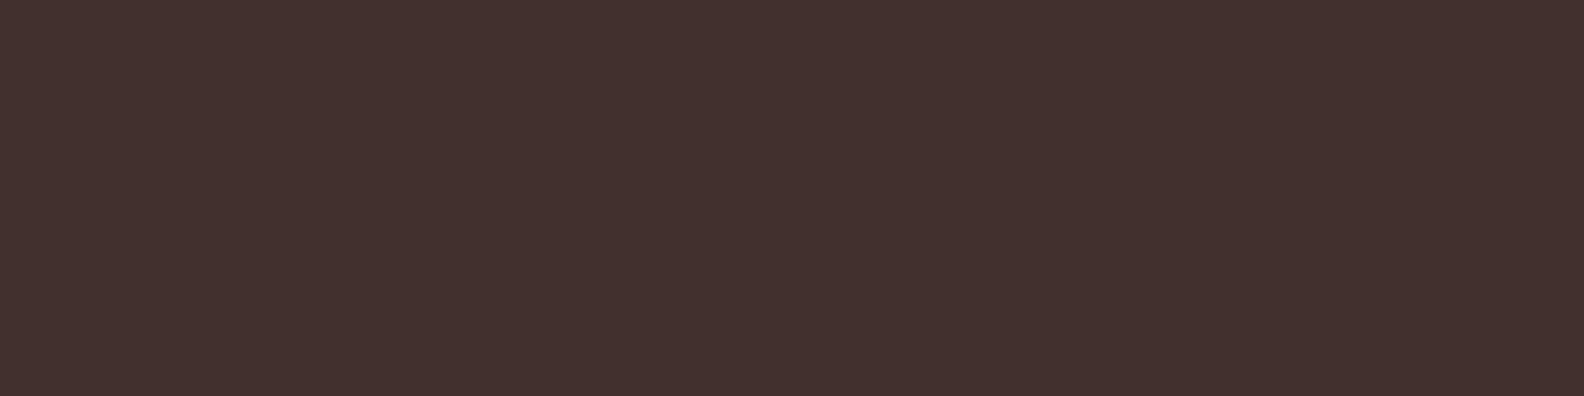 1584x396 Old Burgundy Solid Color Background